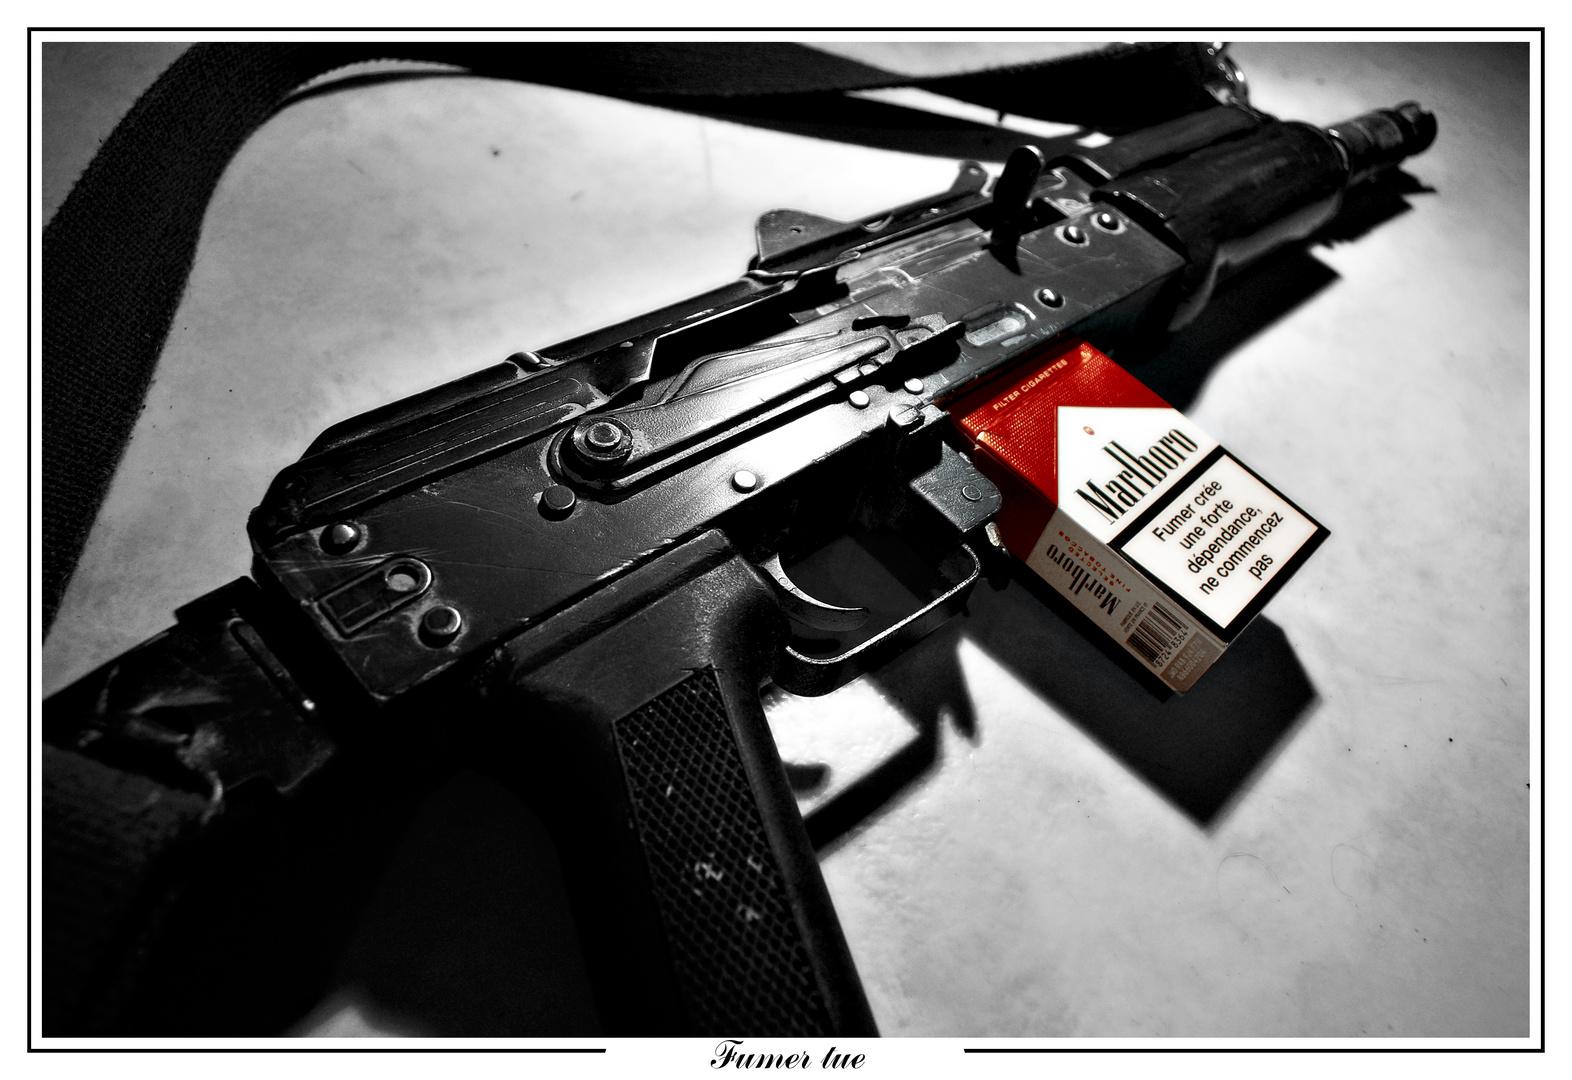 fumer tue